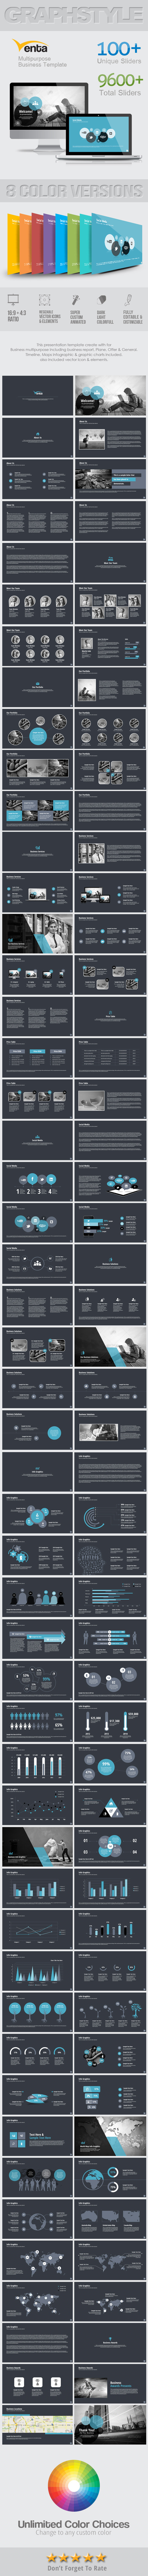 Venta_Multipurpose Business Template